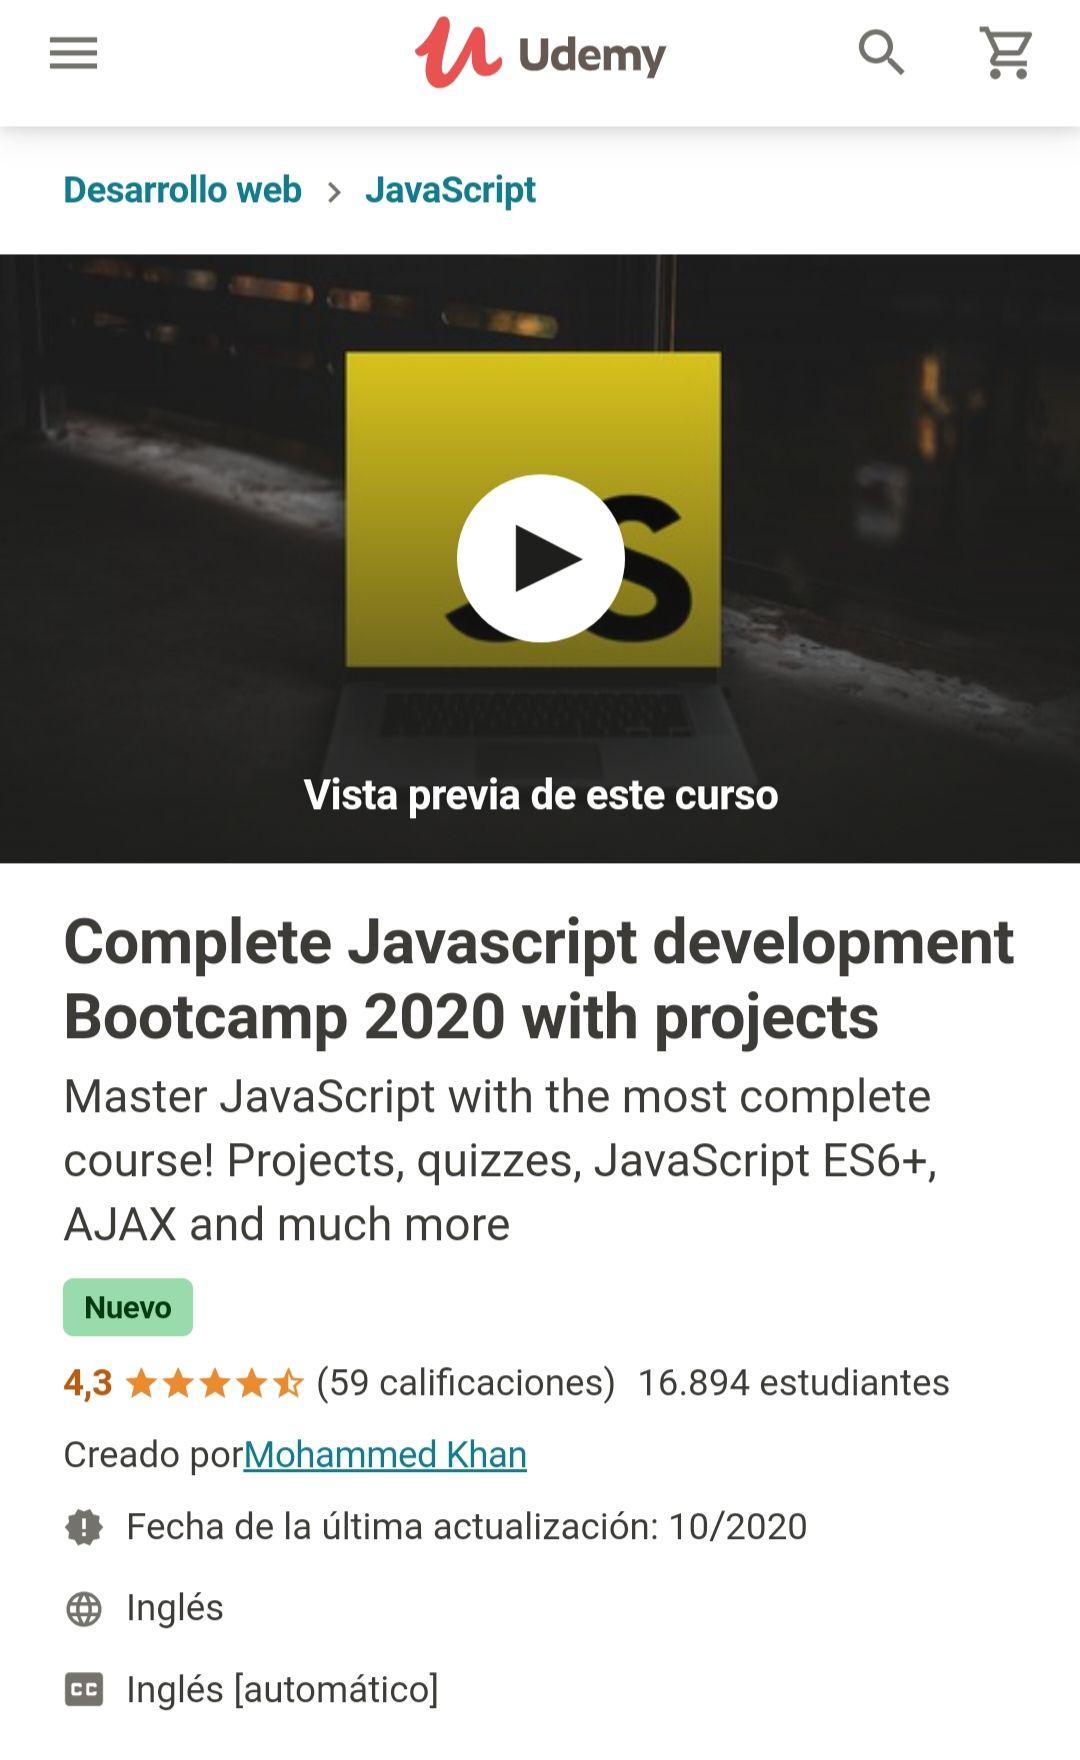 Udemy: Complete Javascript Development Bootcamp 2020